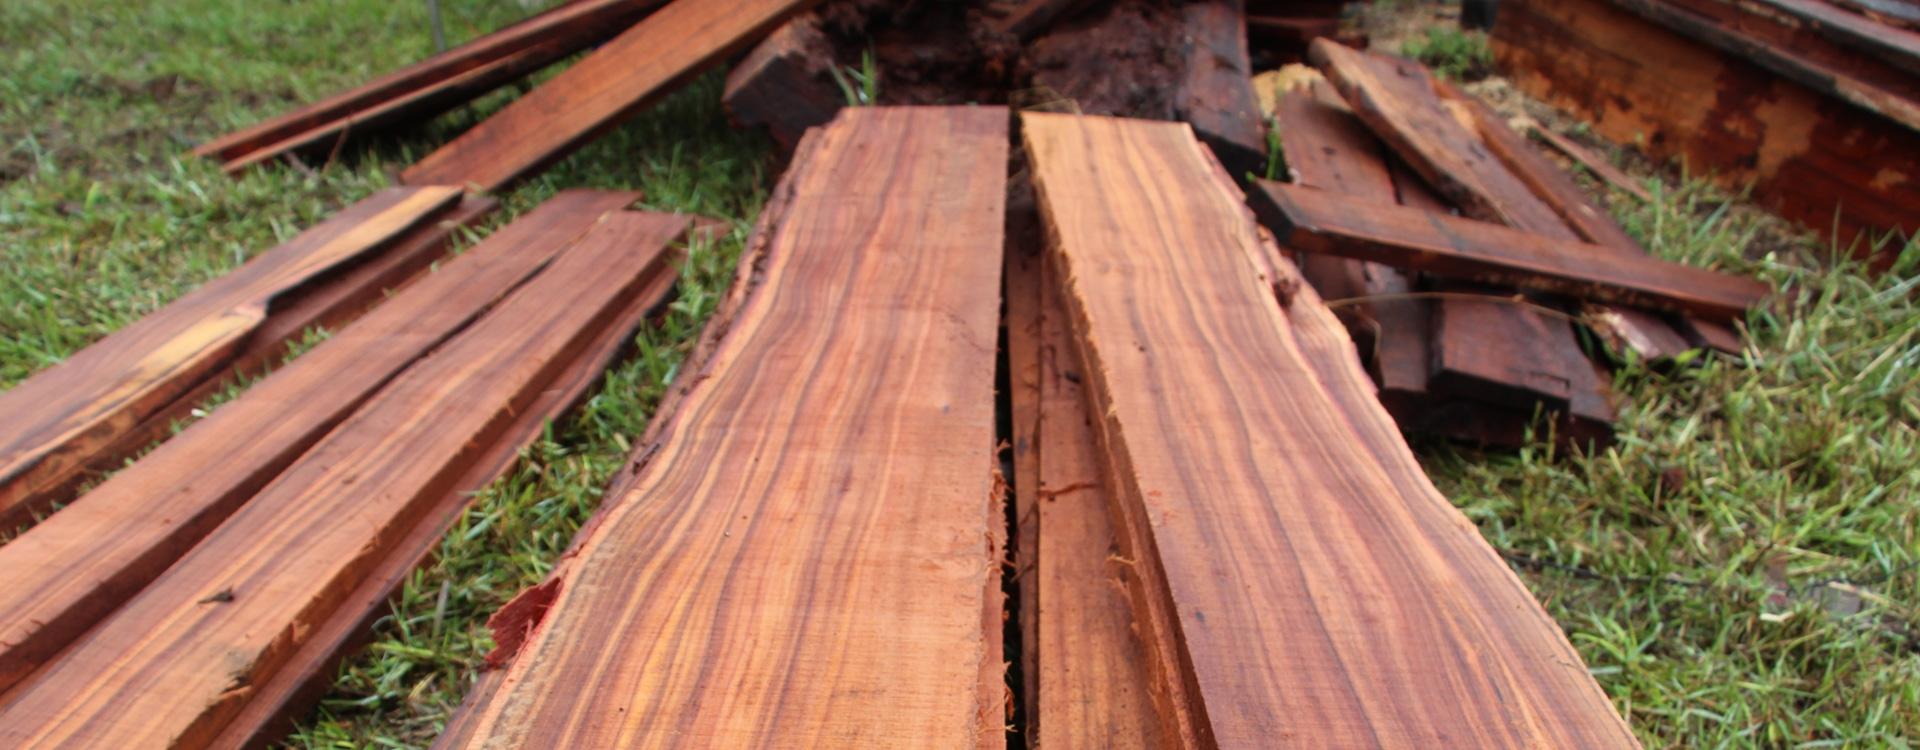 Koa Timber